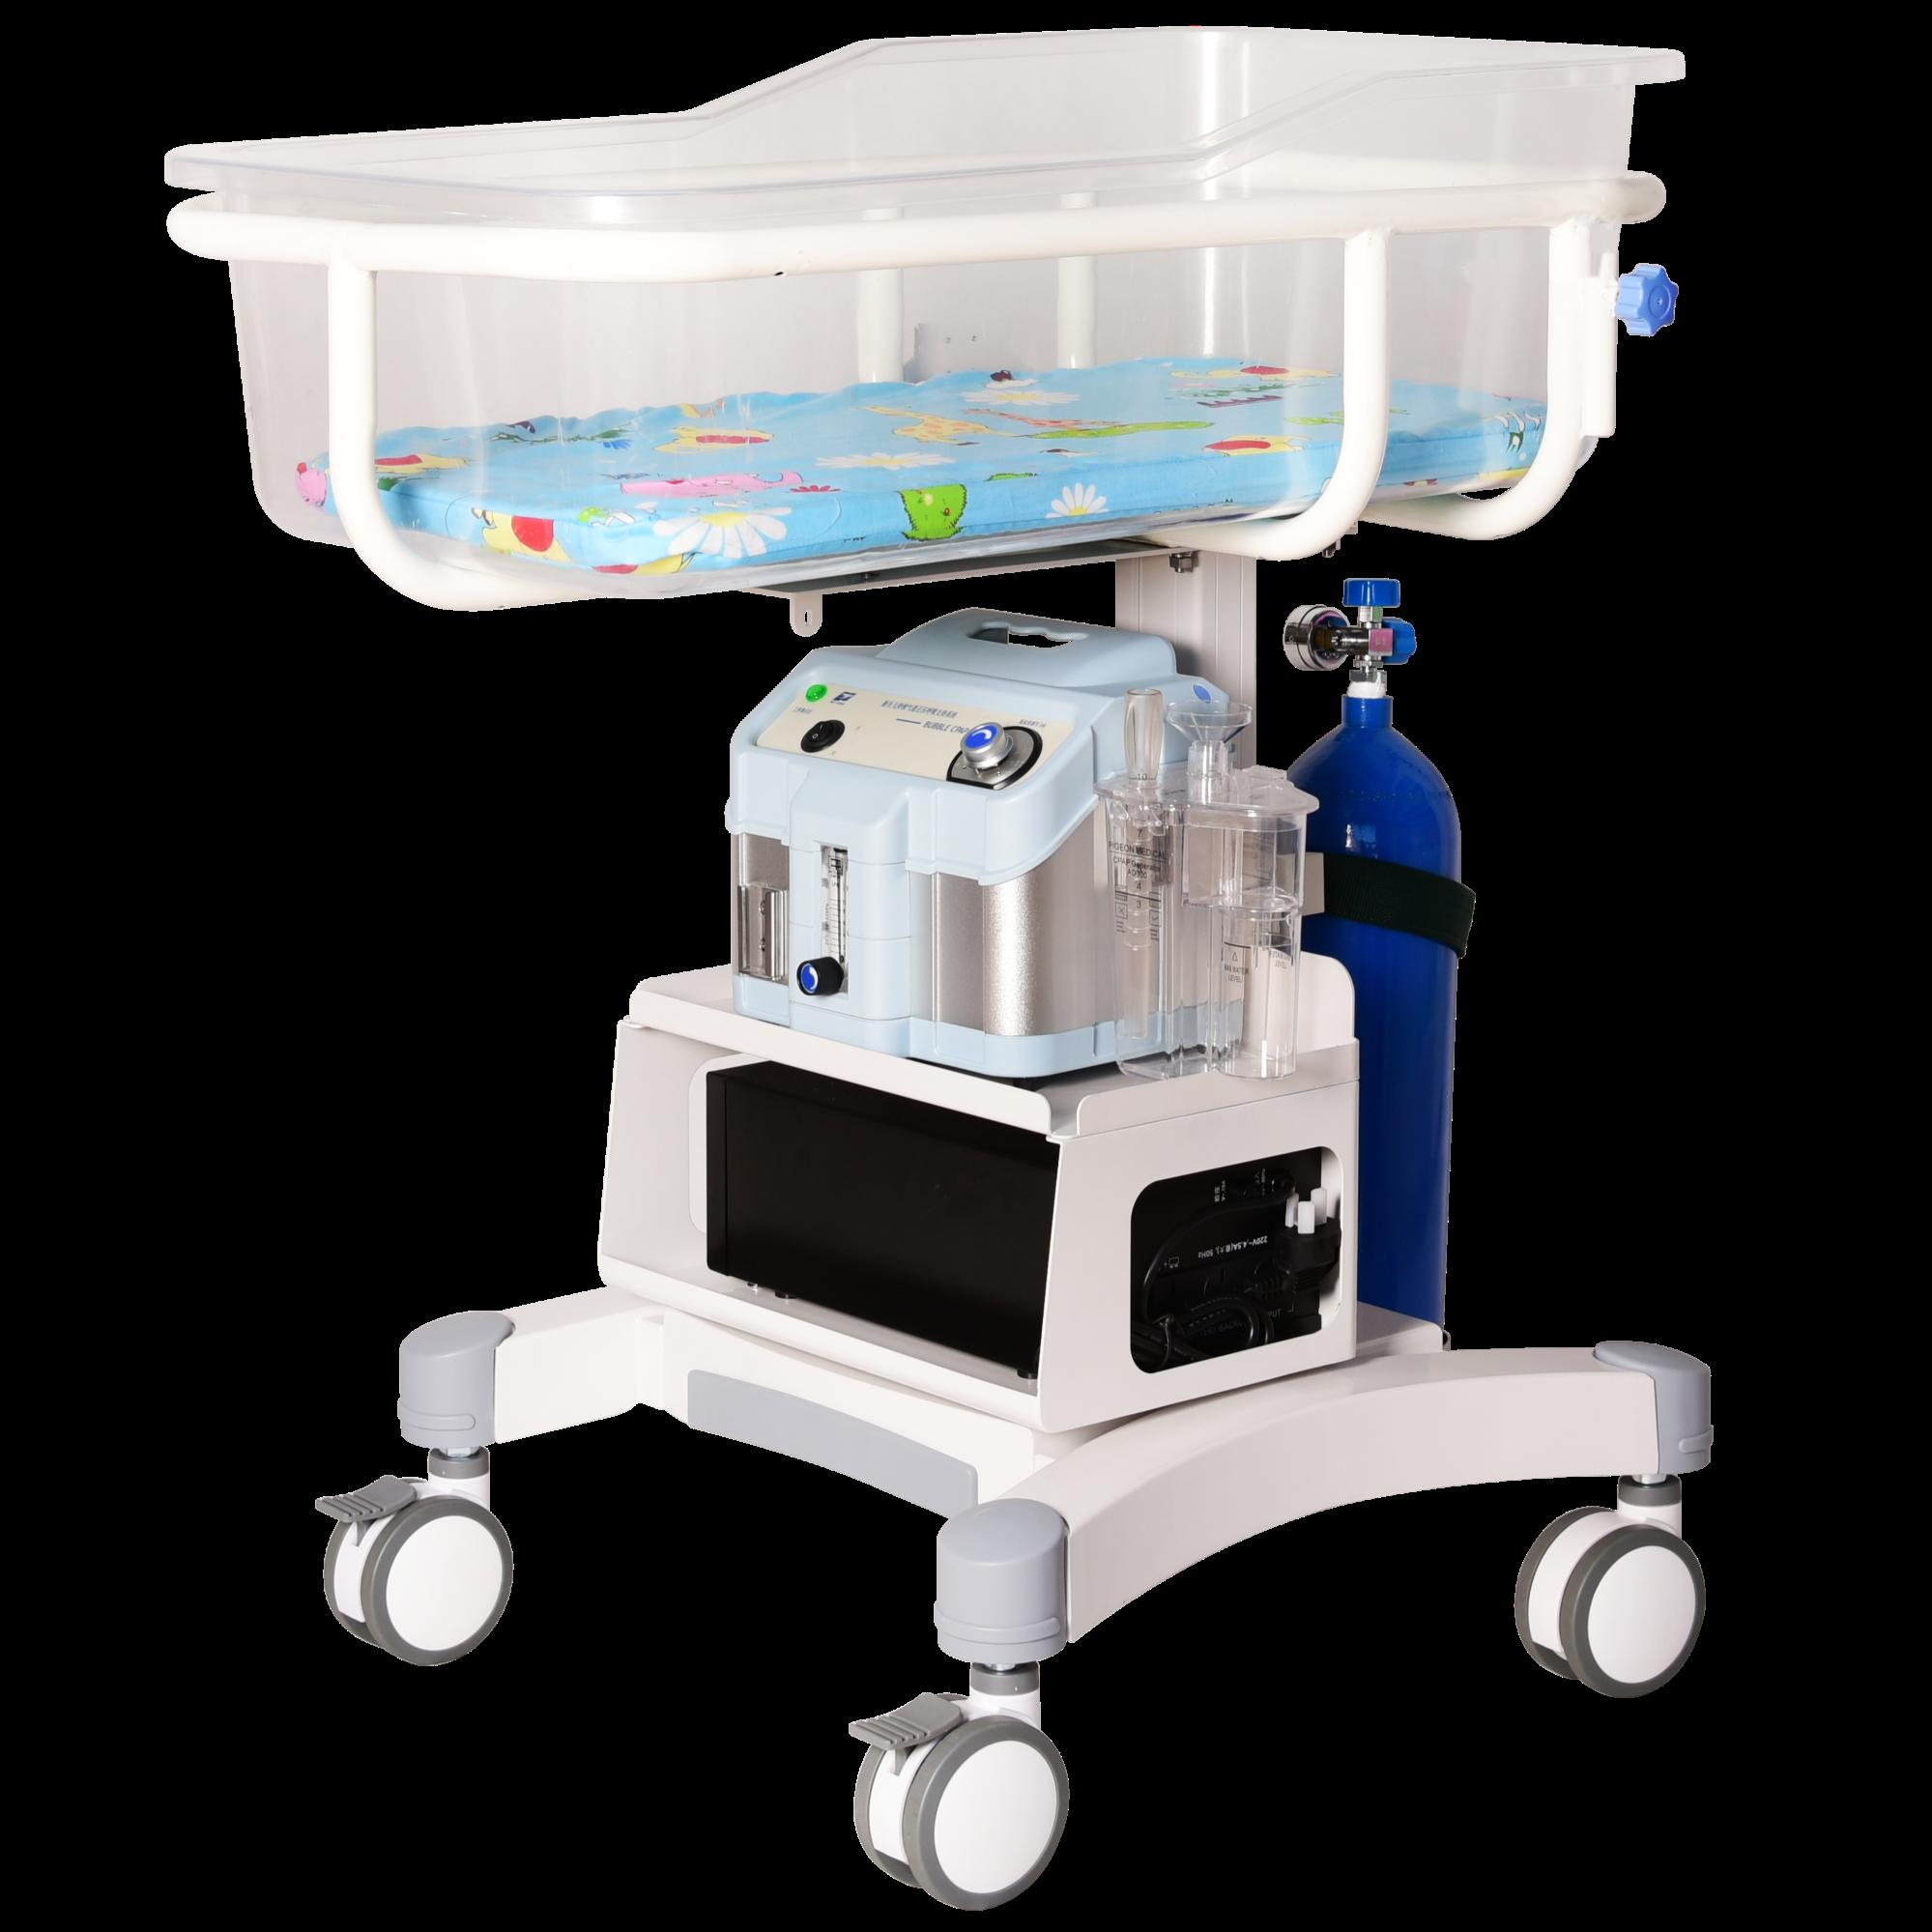 High quality pediatric emergency transfer vehicle TP-09 - KingCare | KingCare.net